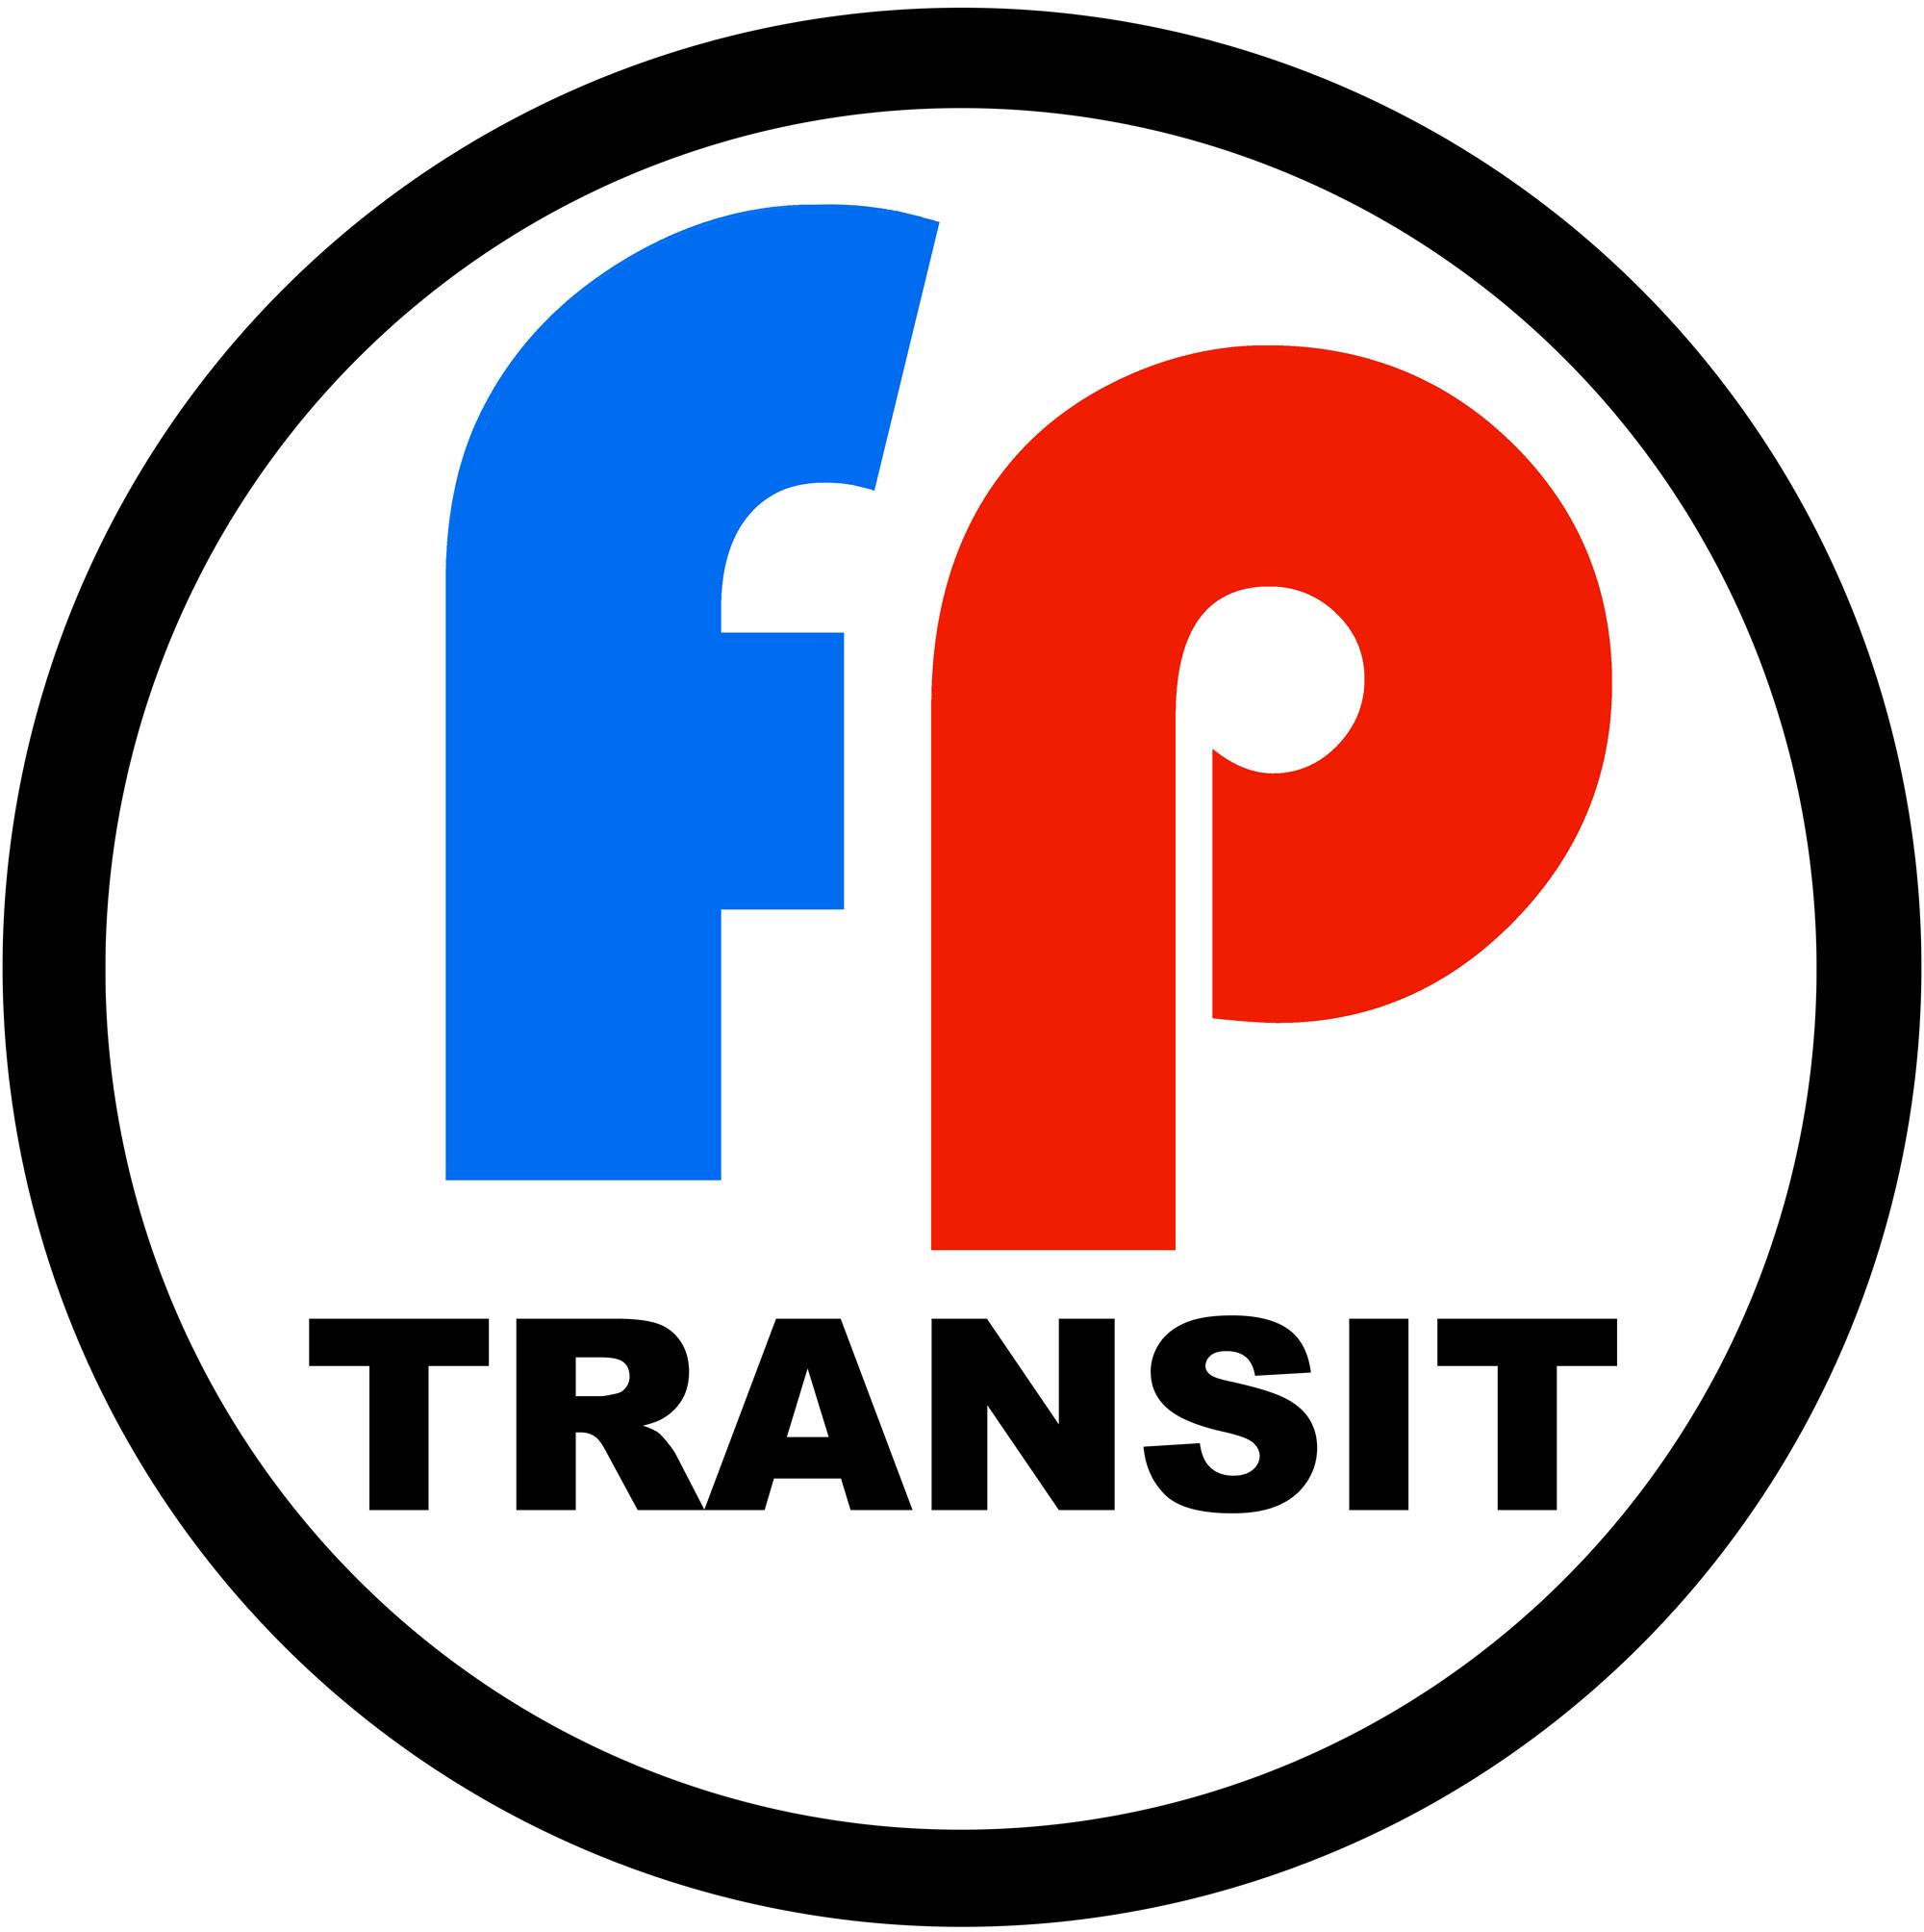 FPtransit